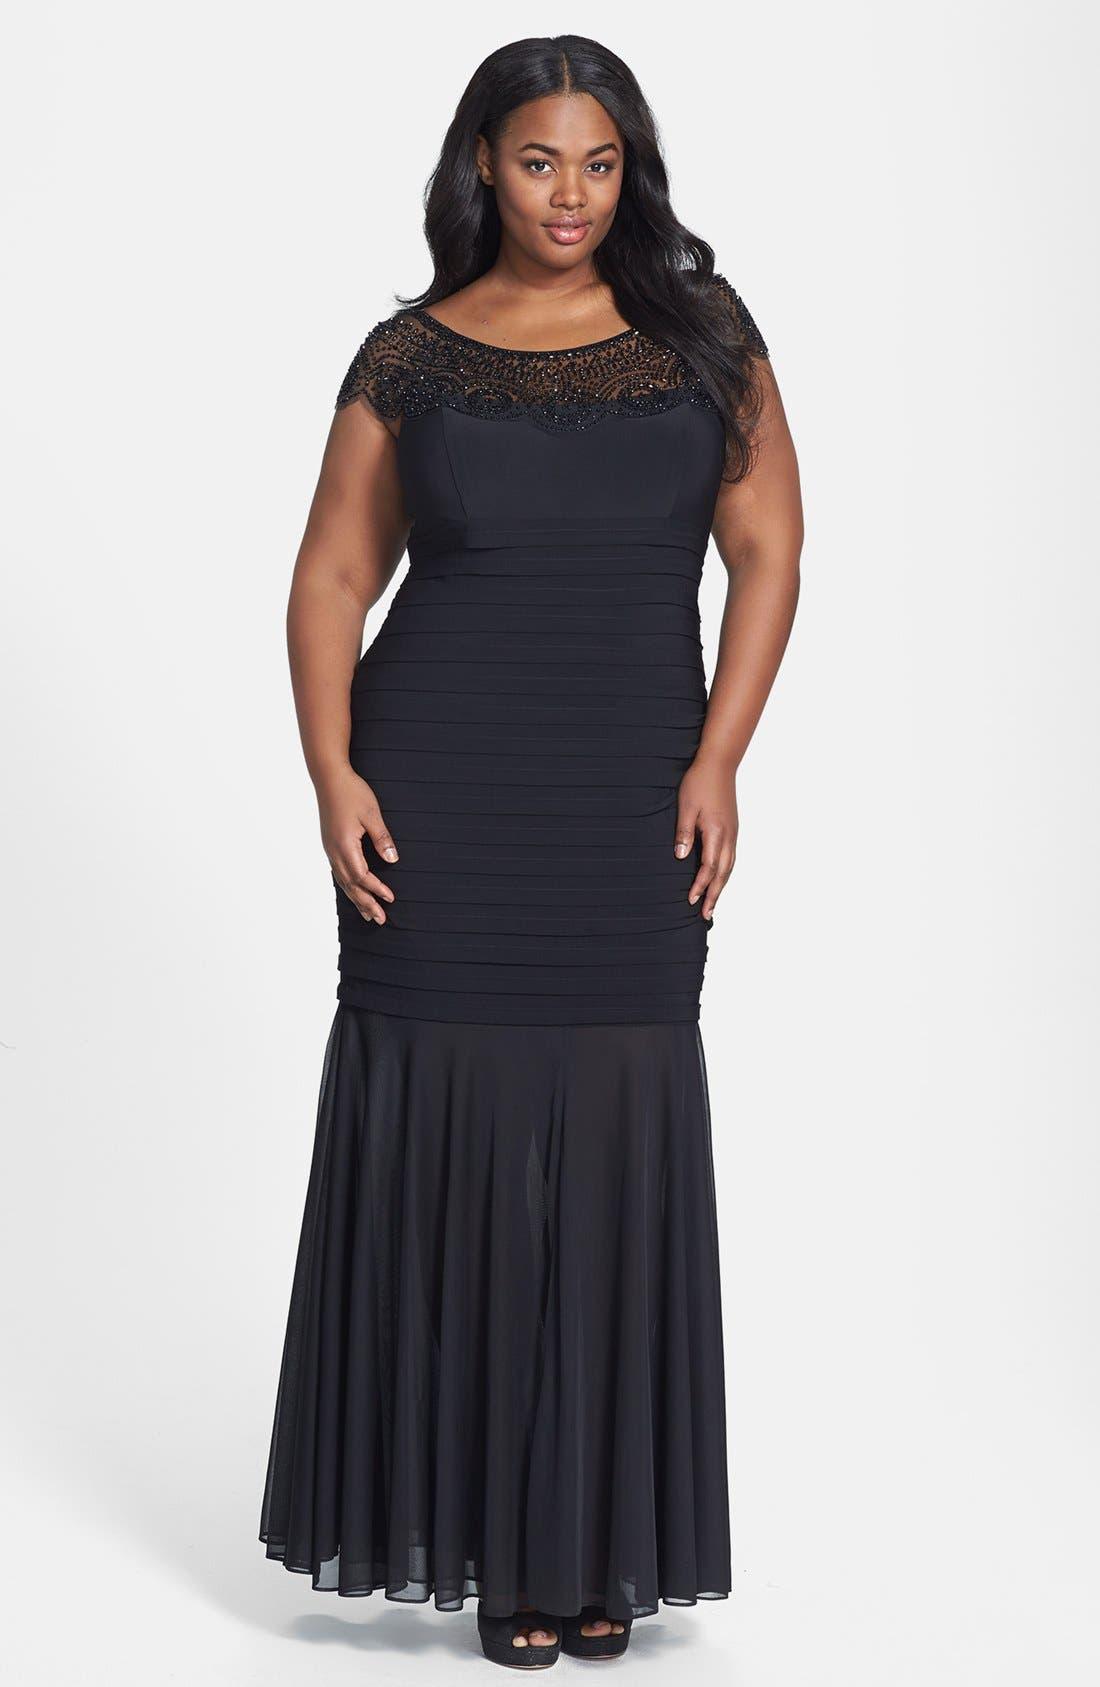 Alternate Image 1 Selected - Xscape Beaded Yoke Chiffon Gown (Plus Size)